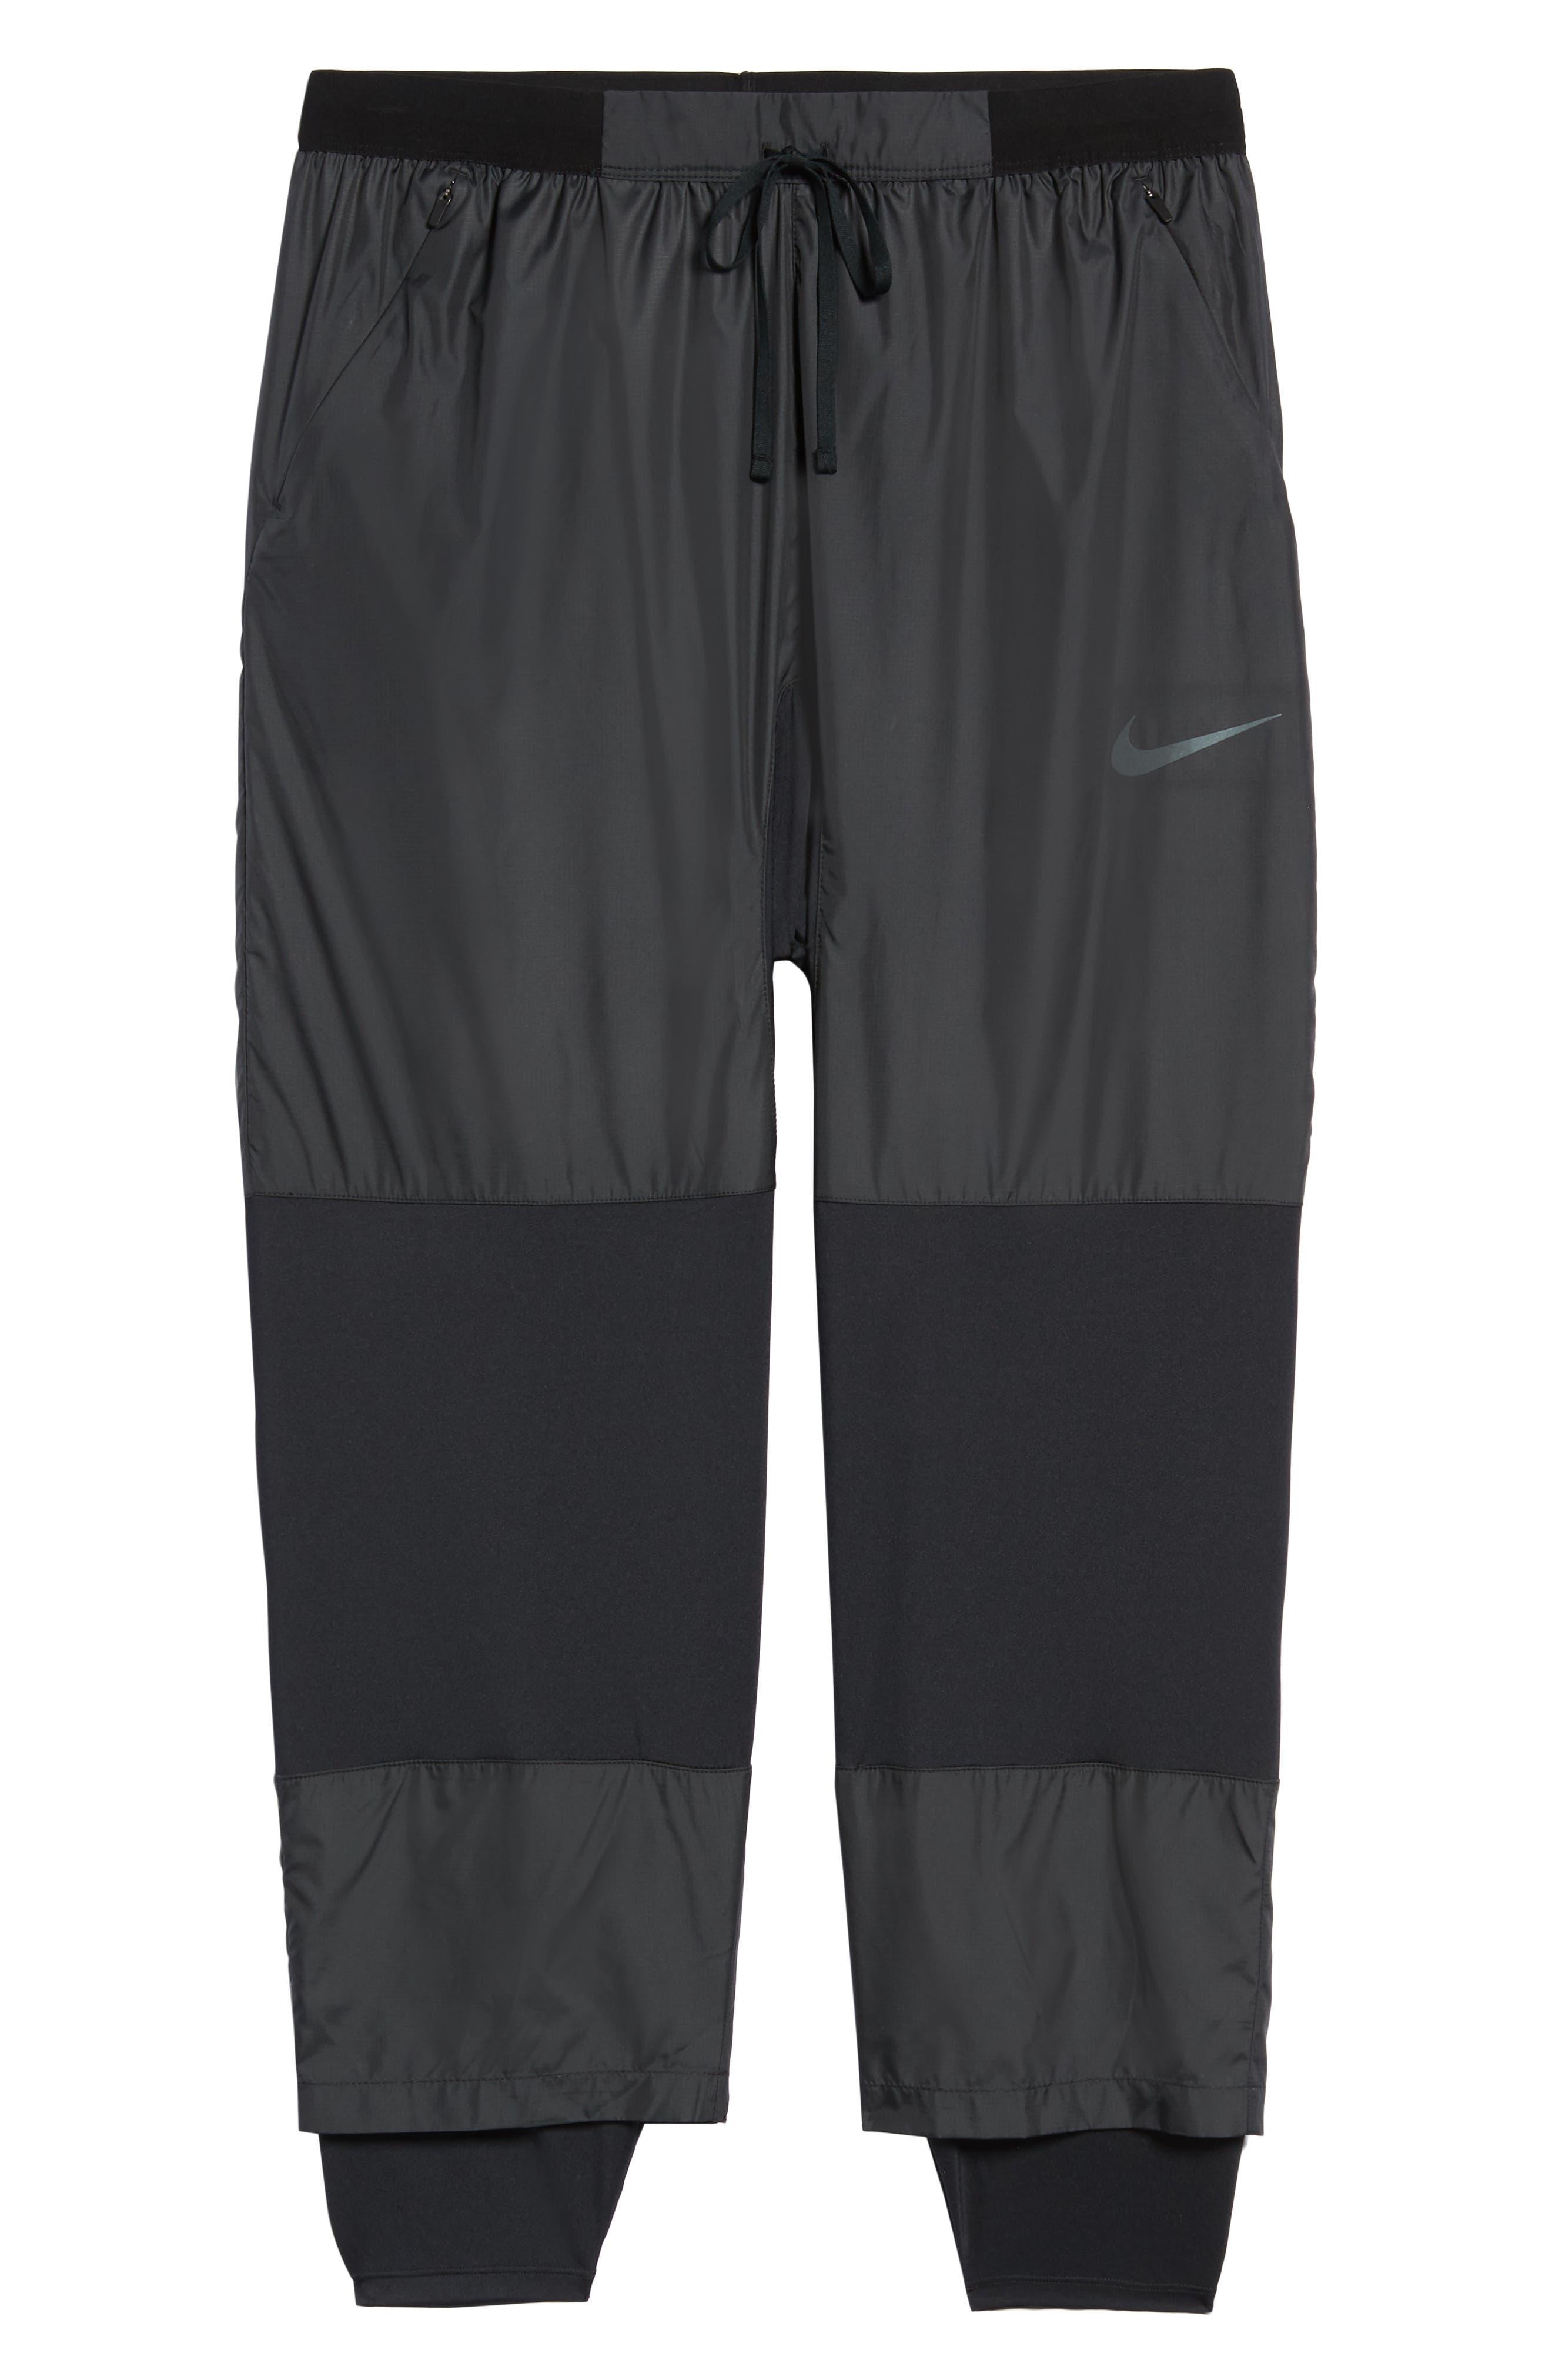 Dry Division Tech Running Pants,                             Alternate thumbnail 6, color,                             BLACK/ BLACK